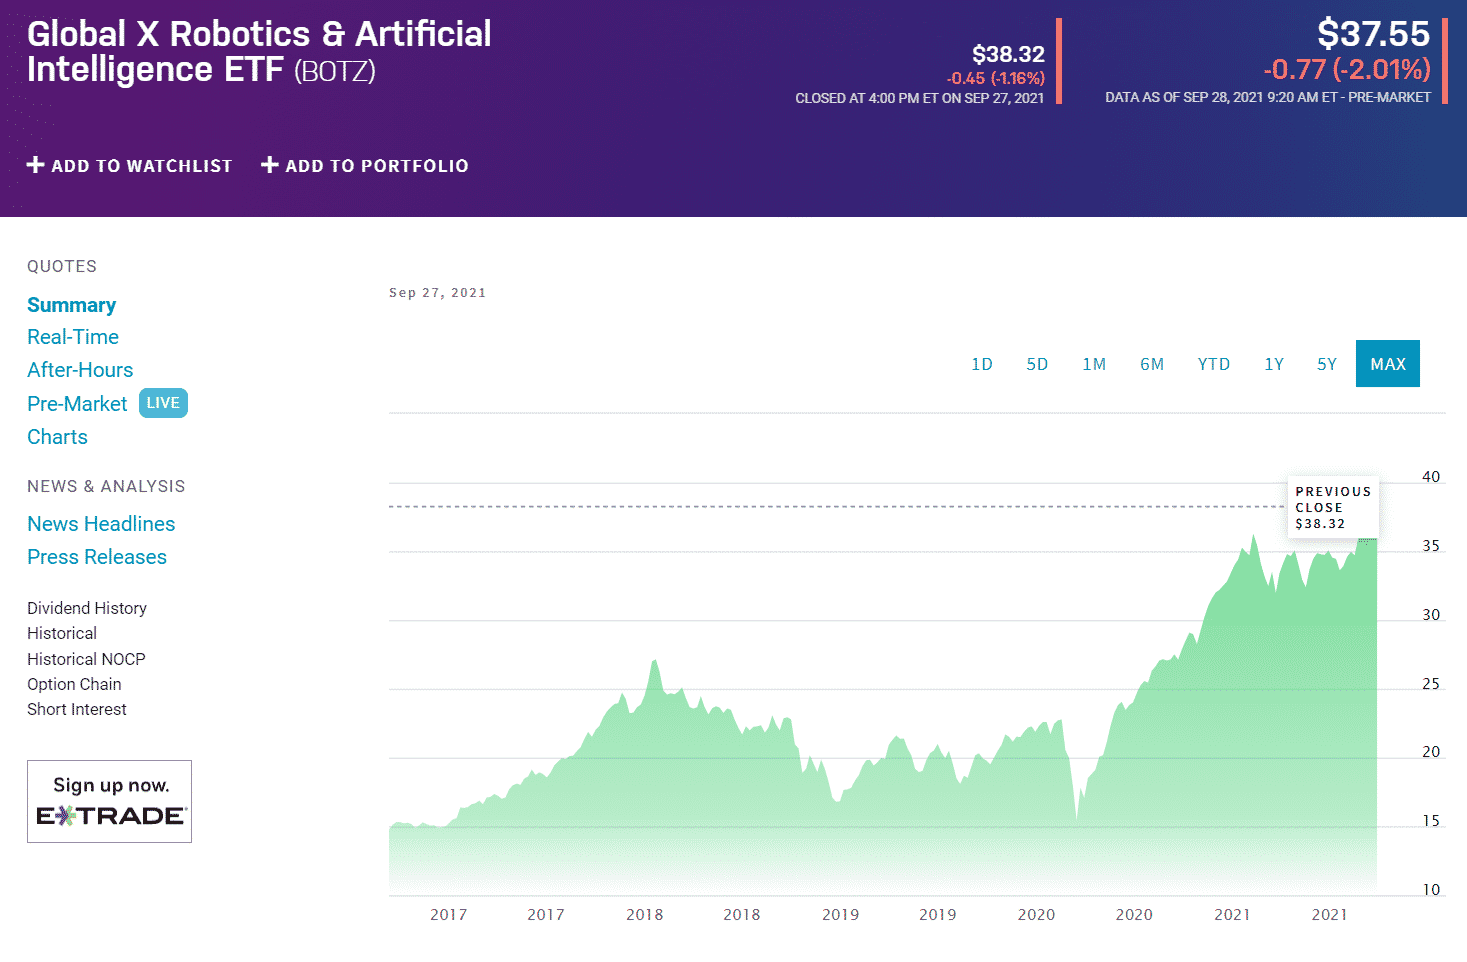 Global X Robotics & AI ETF (BOTS) chart